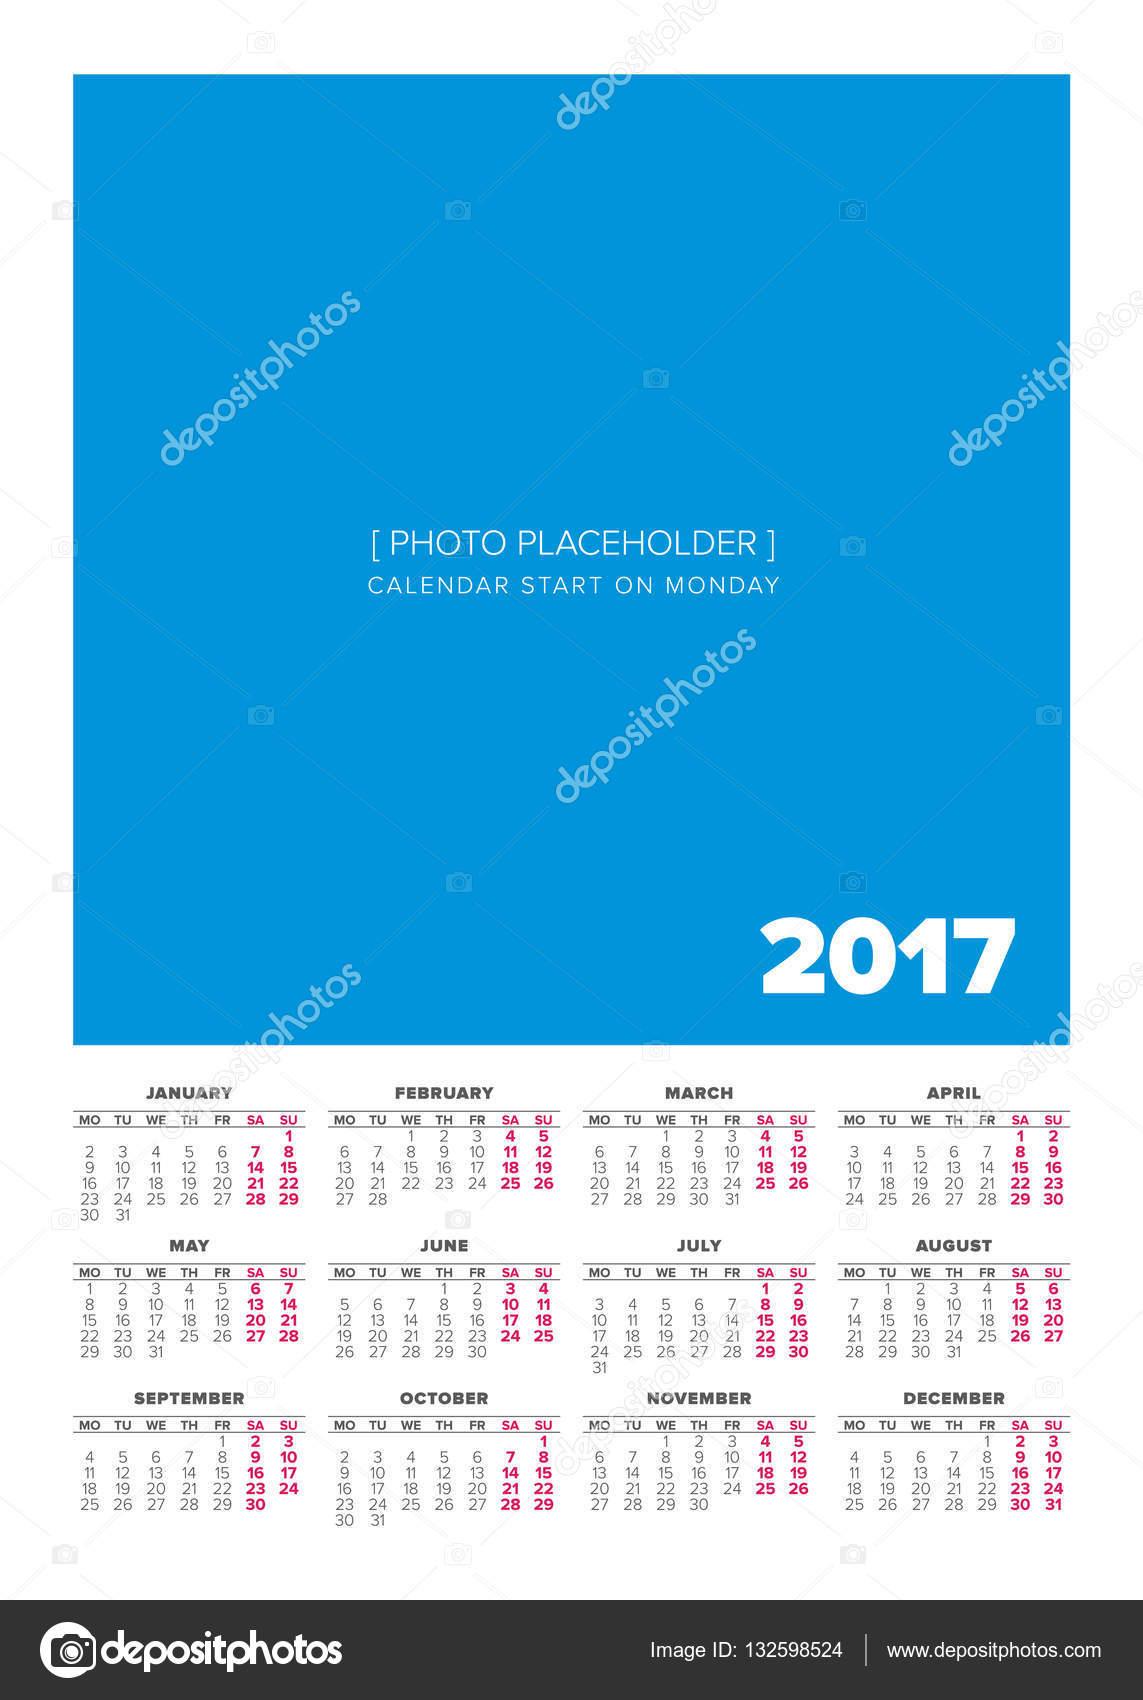 Calendario Anno 2017.Calendario Anno 2017 Semplice Vettoriali Stock C 123sasha